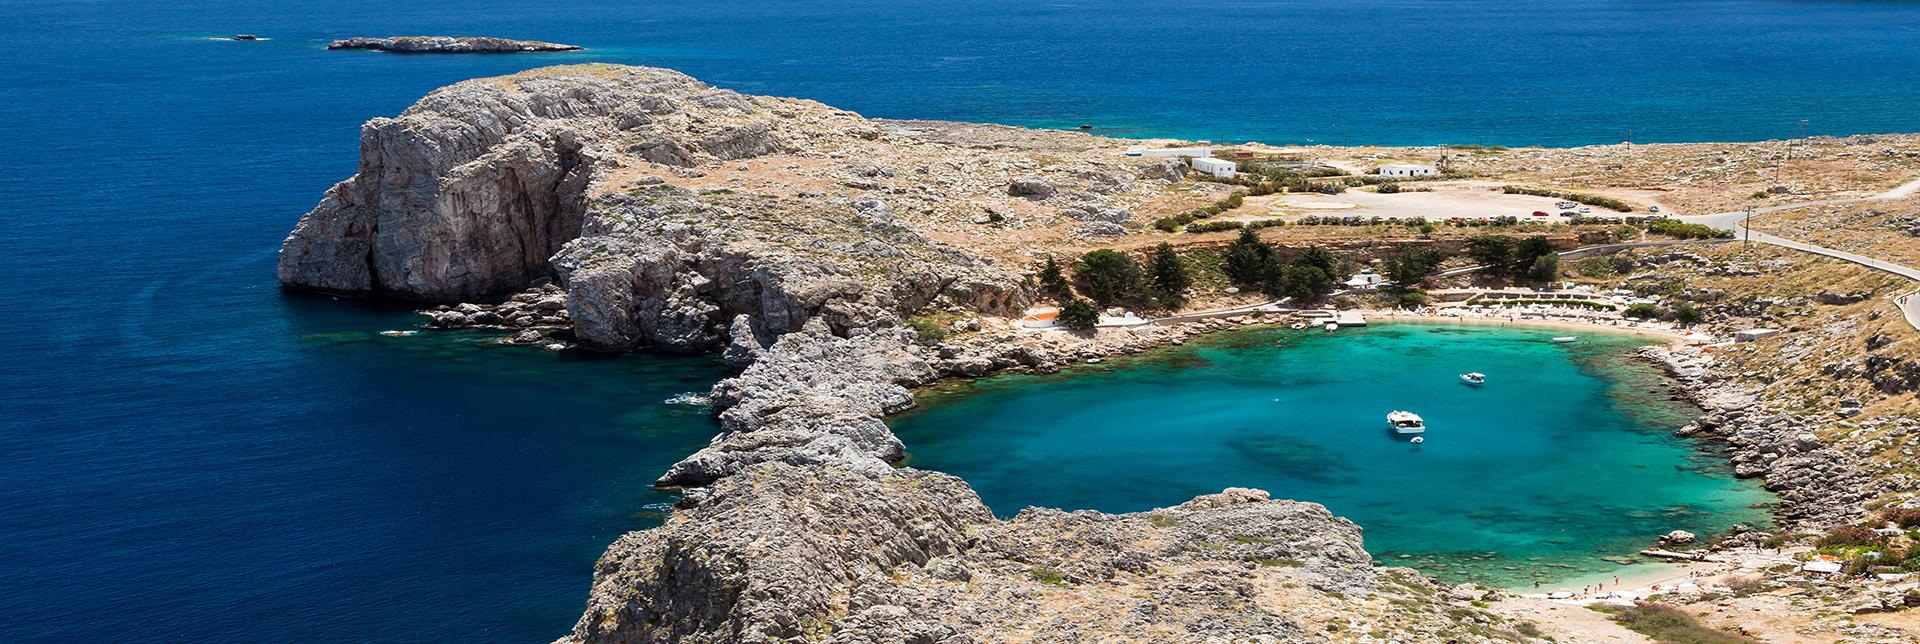 Dodecanese | Kudos Life Experiences